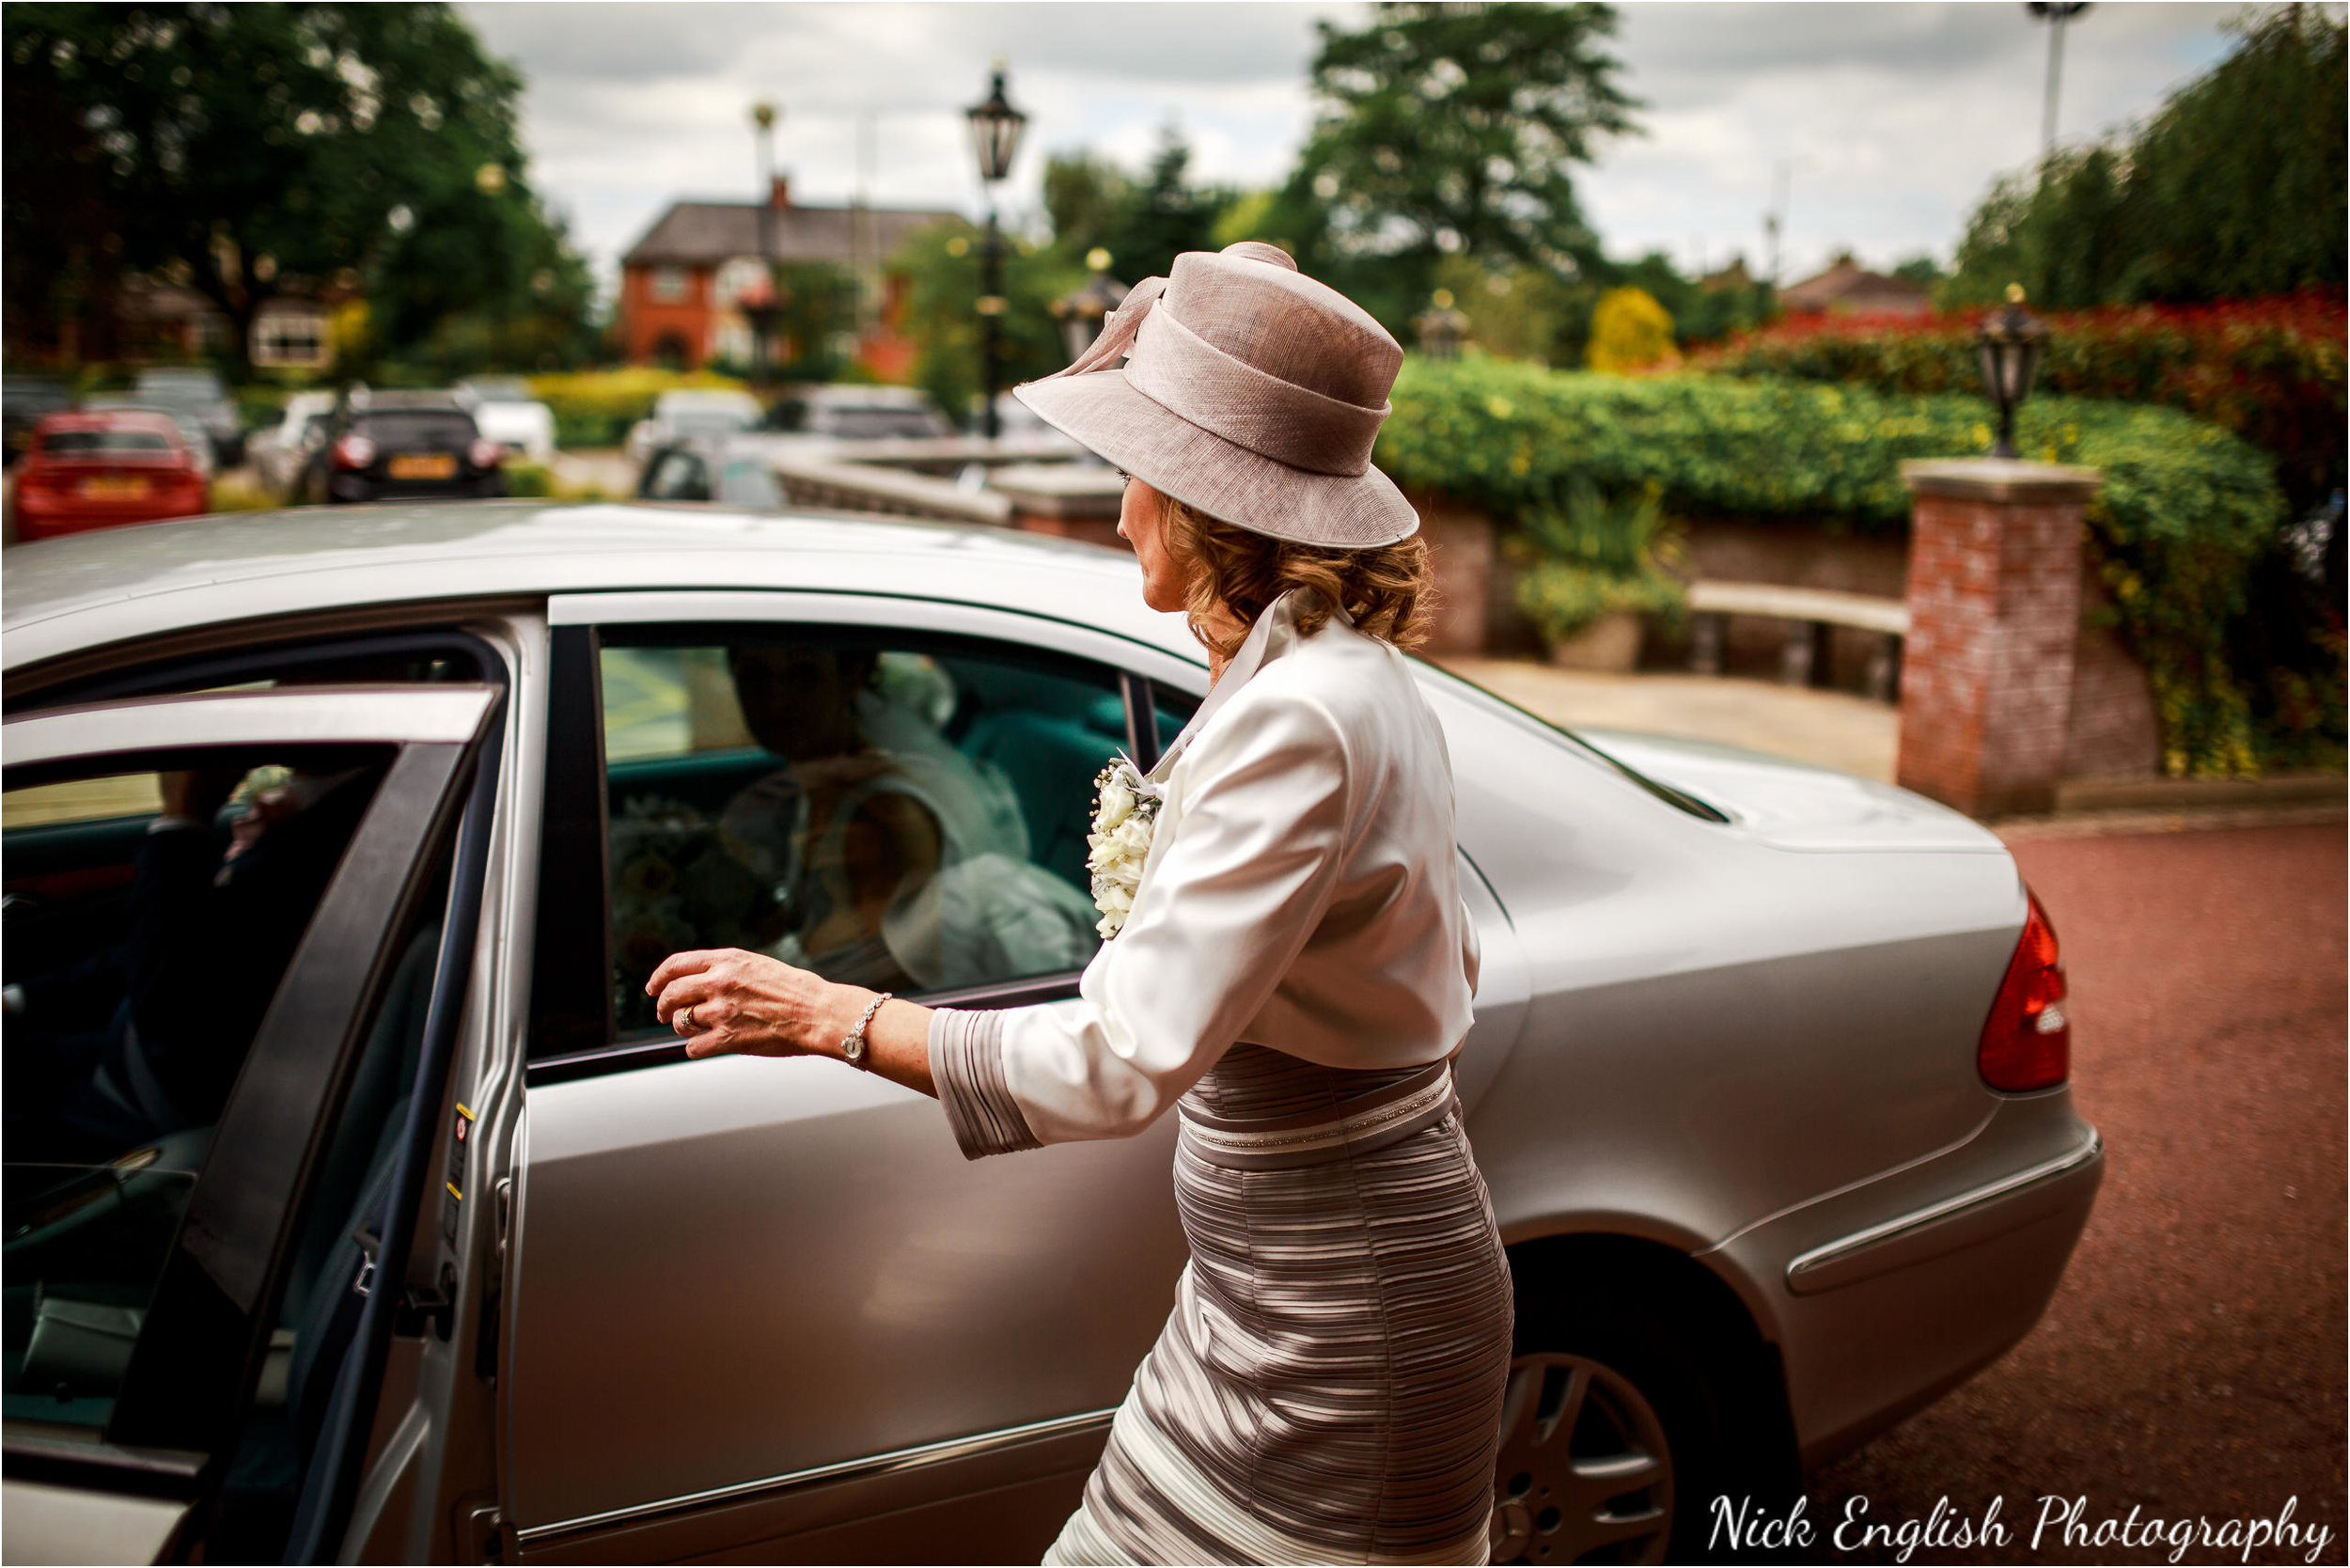 Emily David Wedding Photographs at Barton Grange Preston by Nick English Photography 48jpg.jpeg